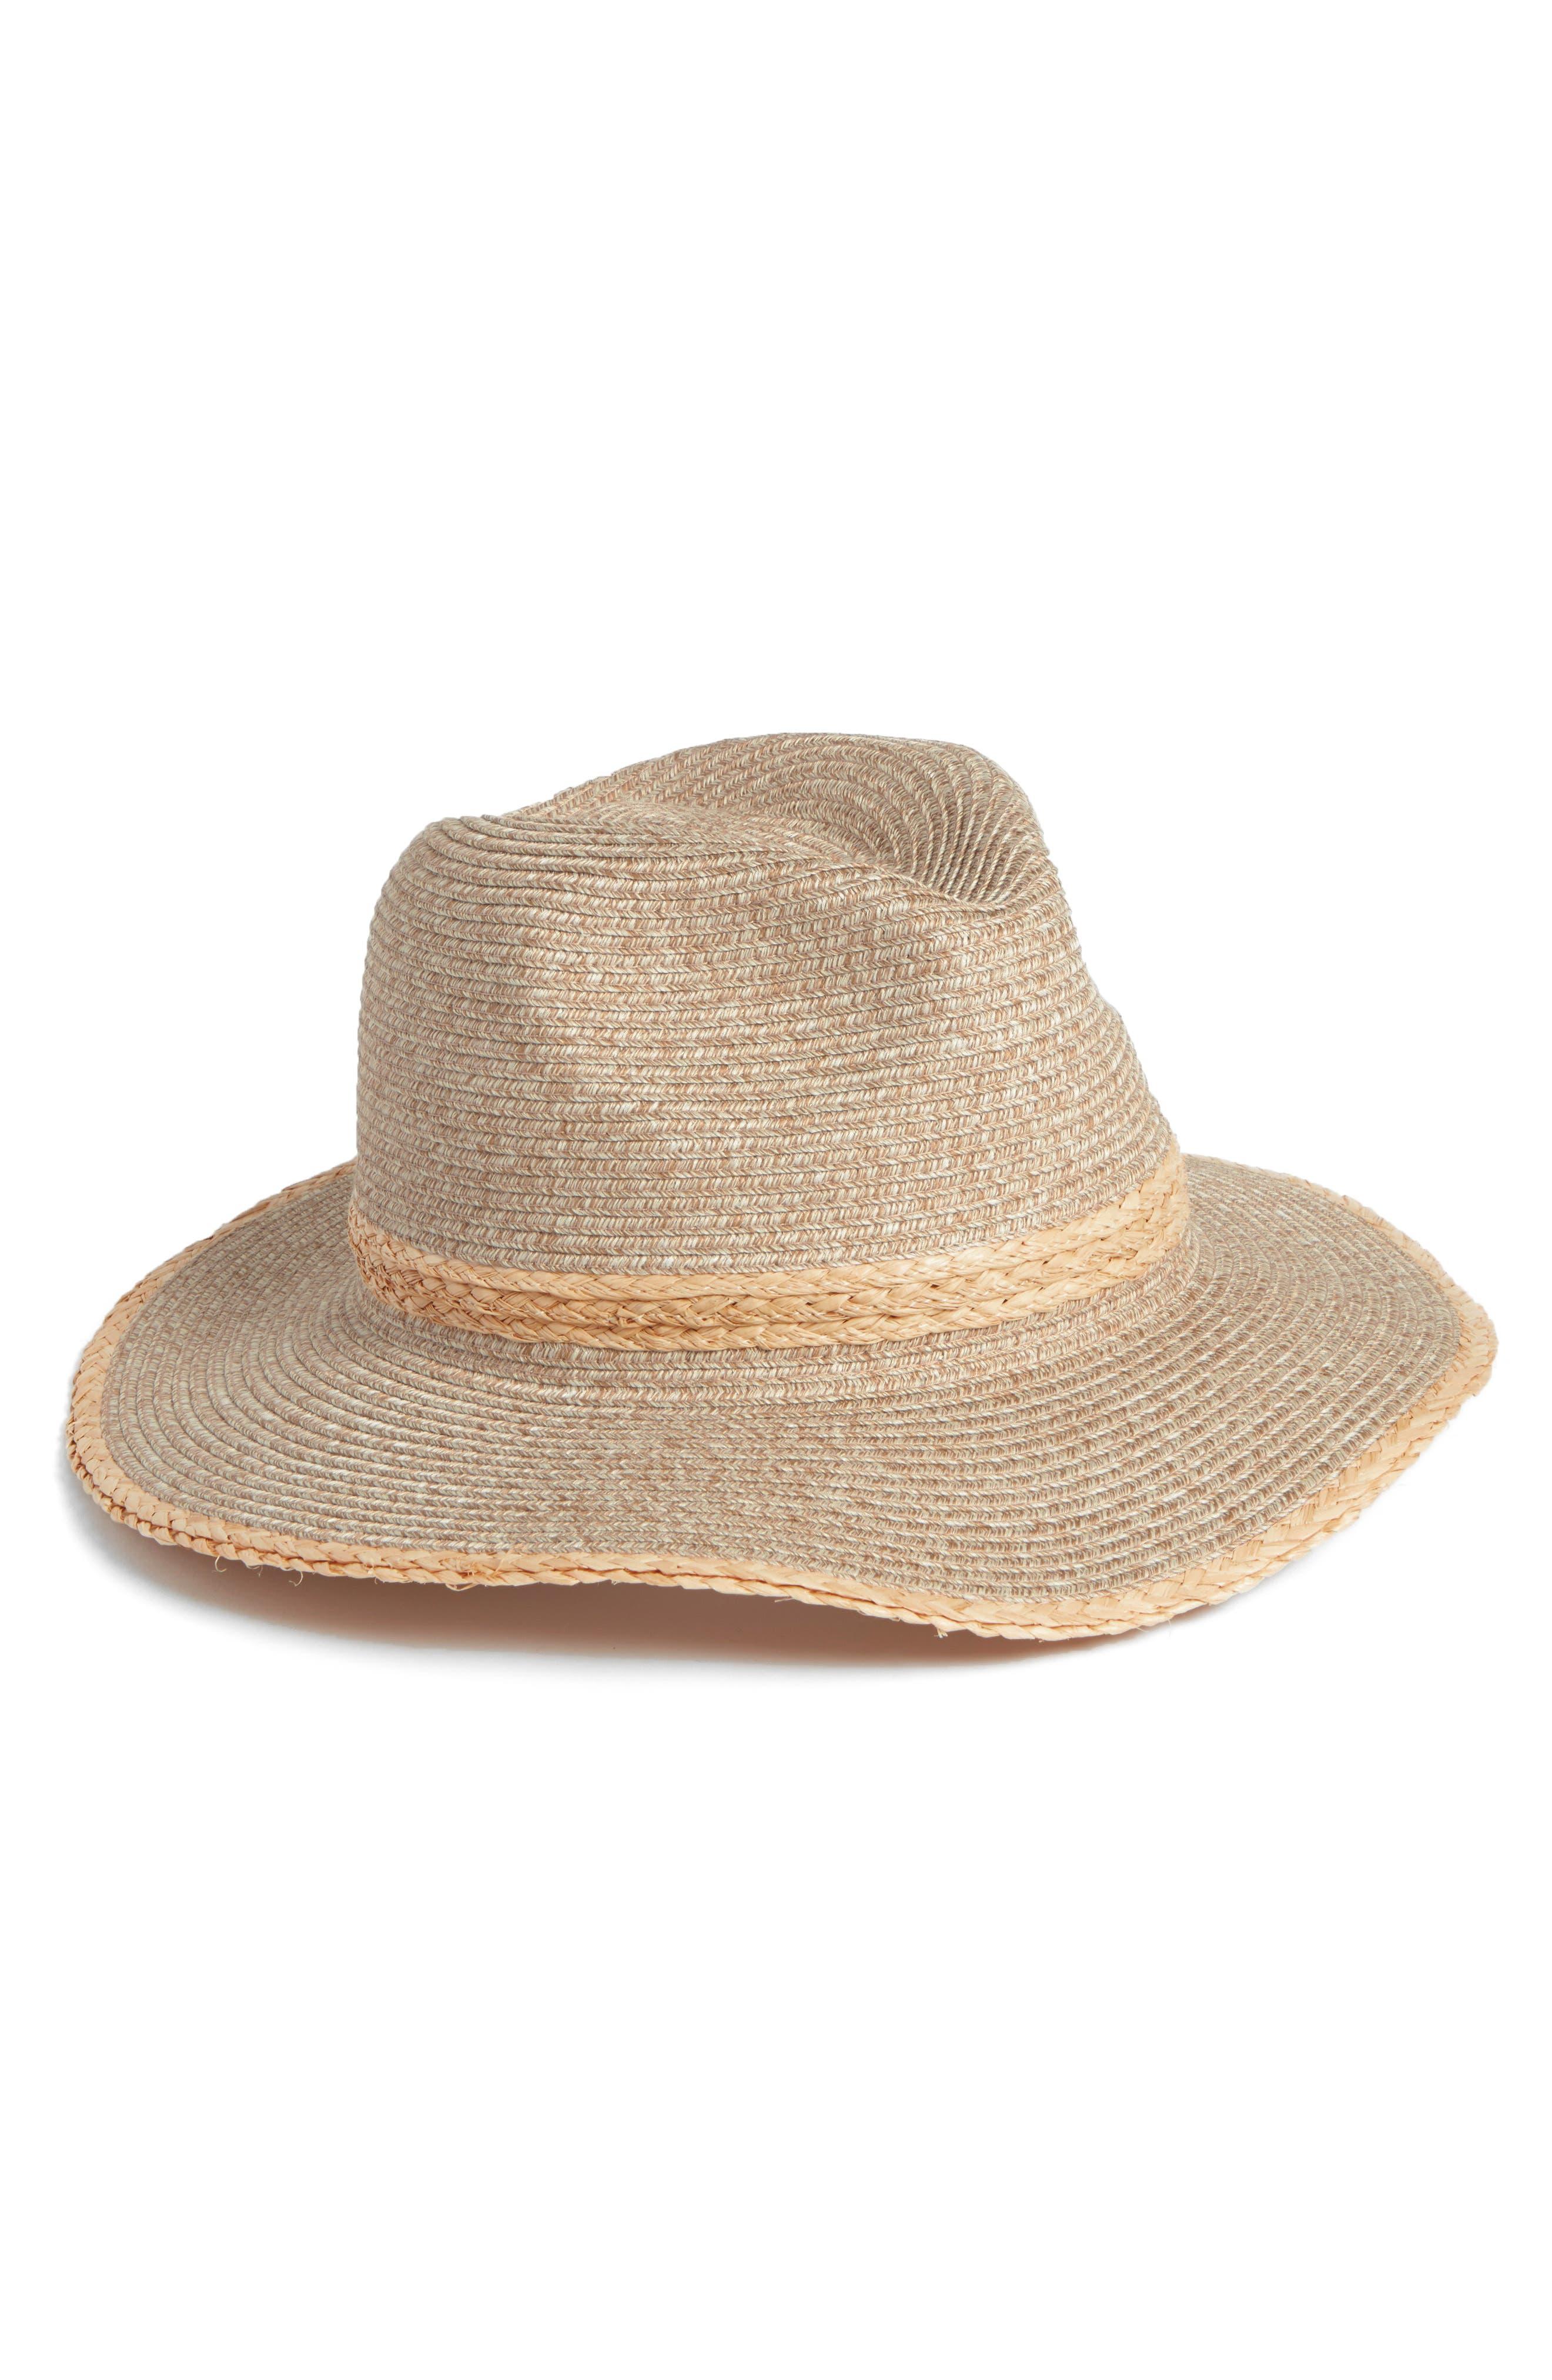 HALOGEN<SUP>®</SUP>, Packable Panama Hat, Main thumbnail 1, color, NATURAL